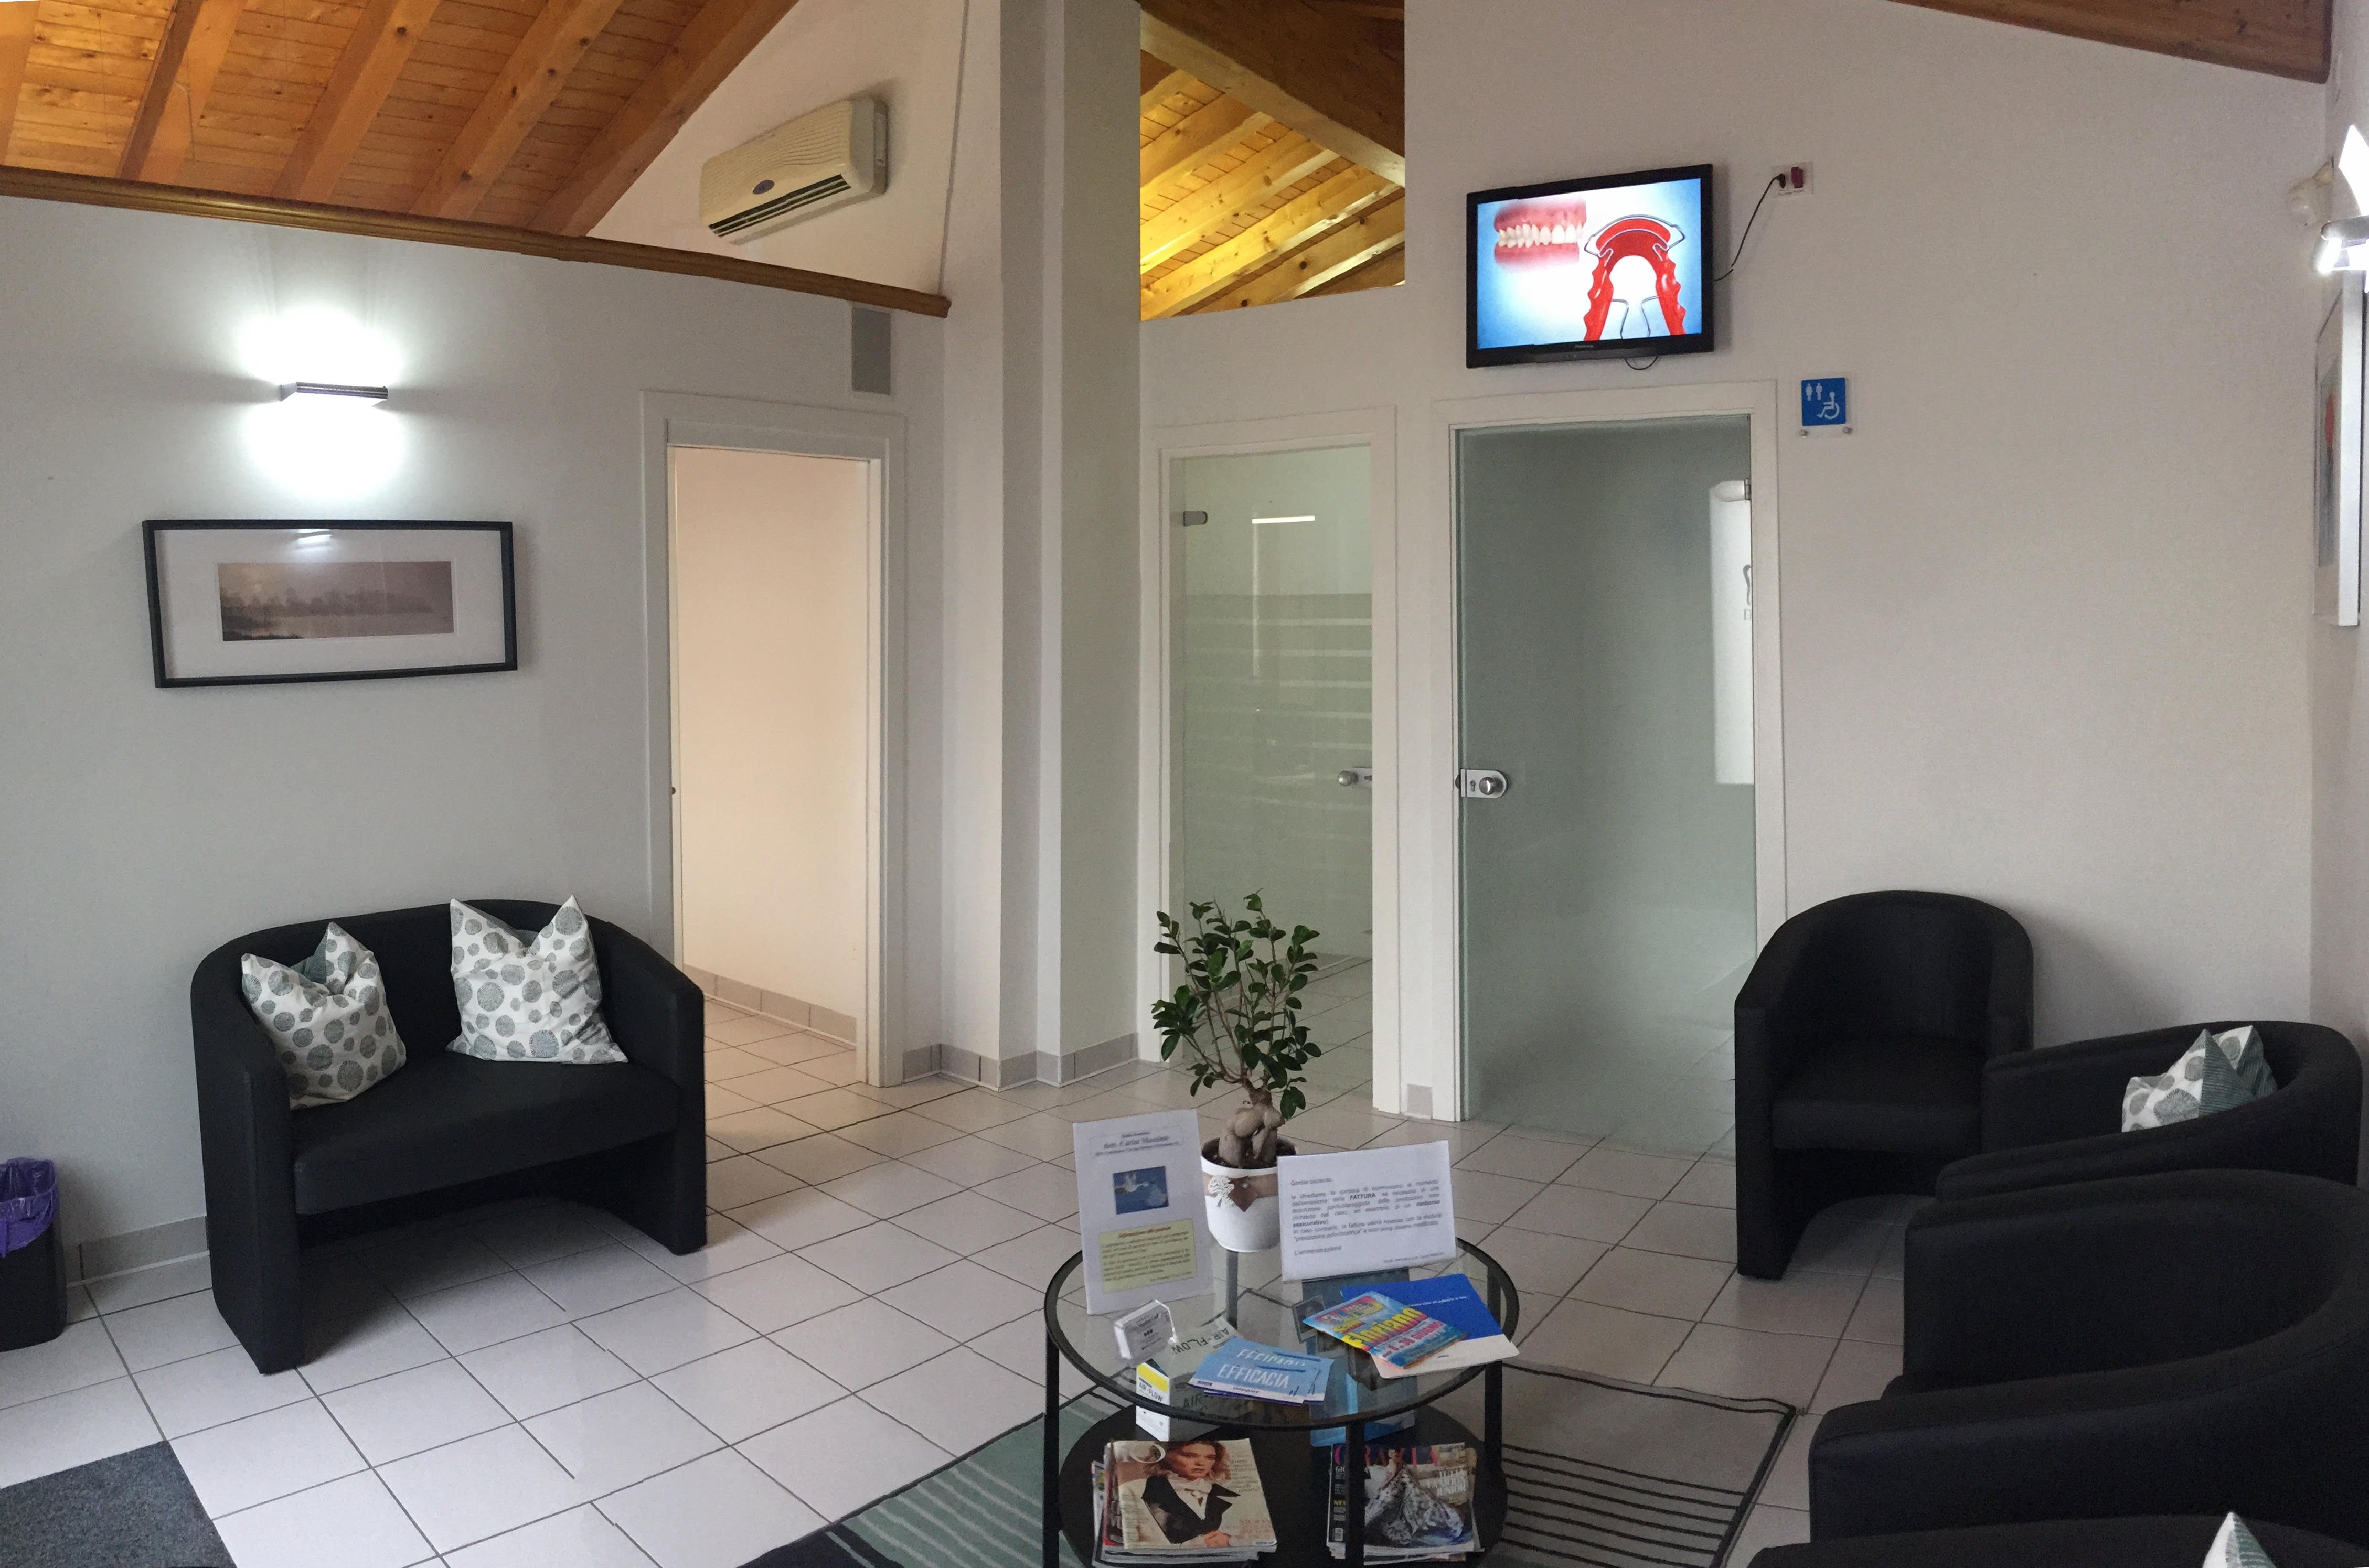 Studio dentistico Castelfranco Veneto Treviso